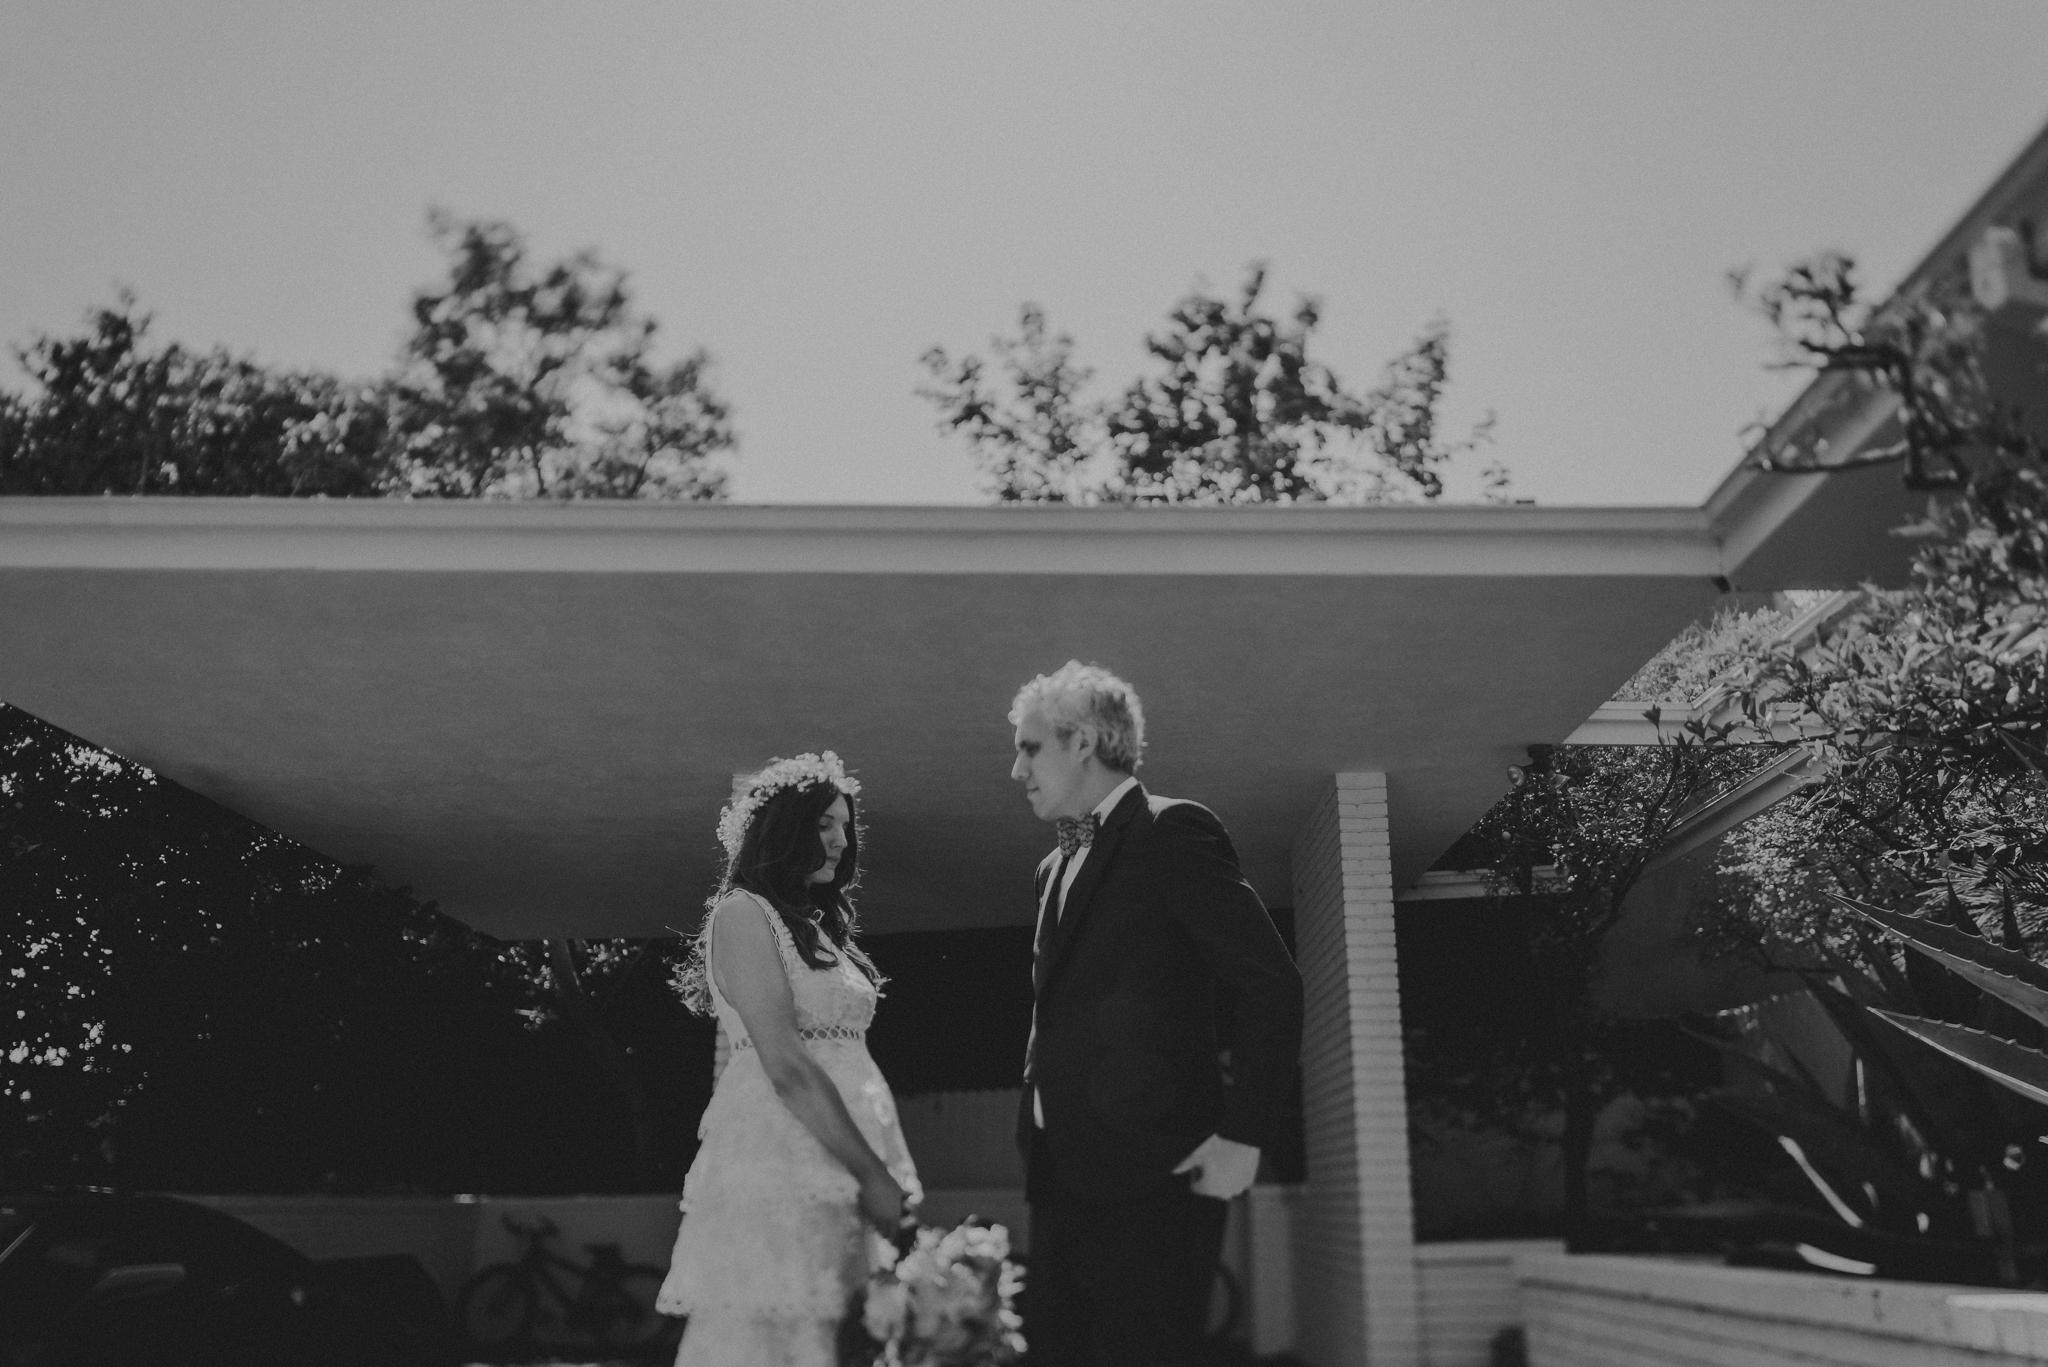 Isaiah + Taylor Photography - Private Estate Backyard Wedding - Beverly Hills - Los Angeles Wedding Photographer - 24.jpg